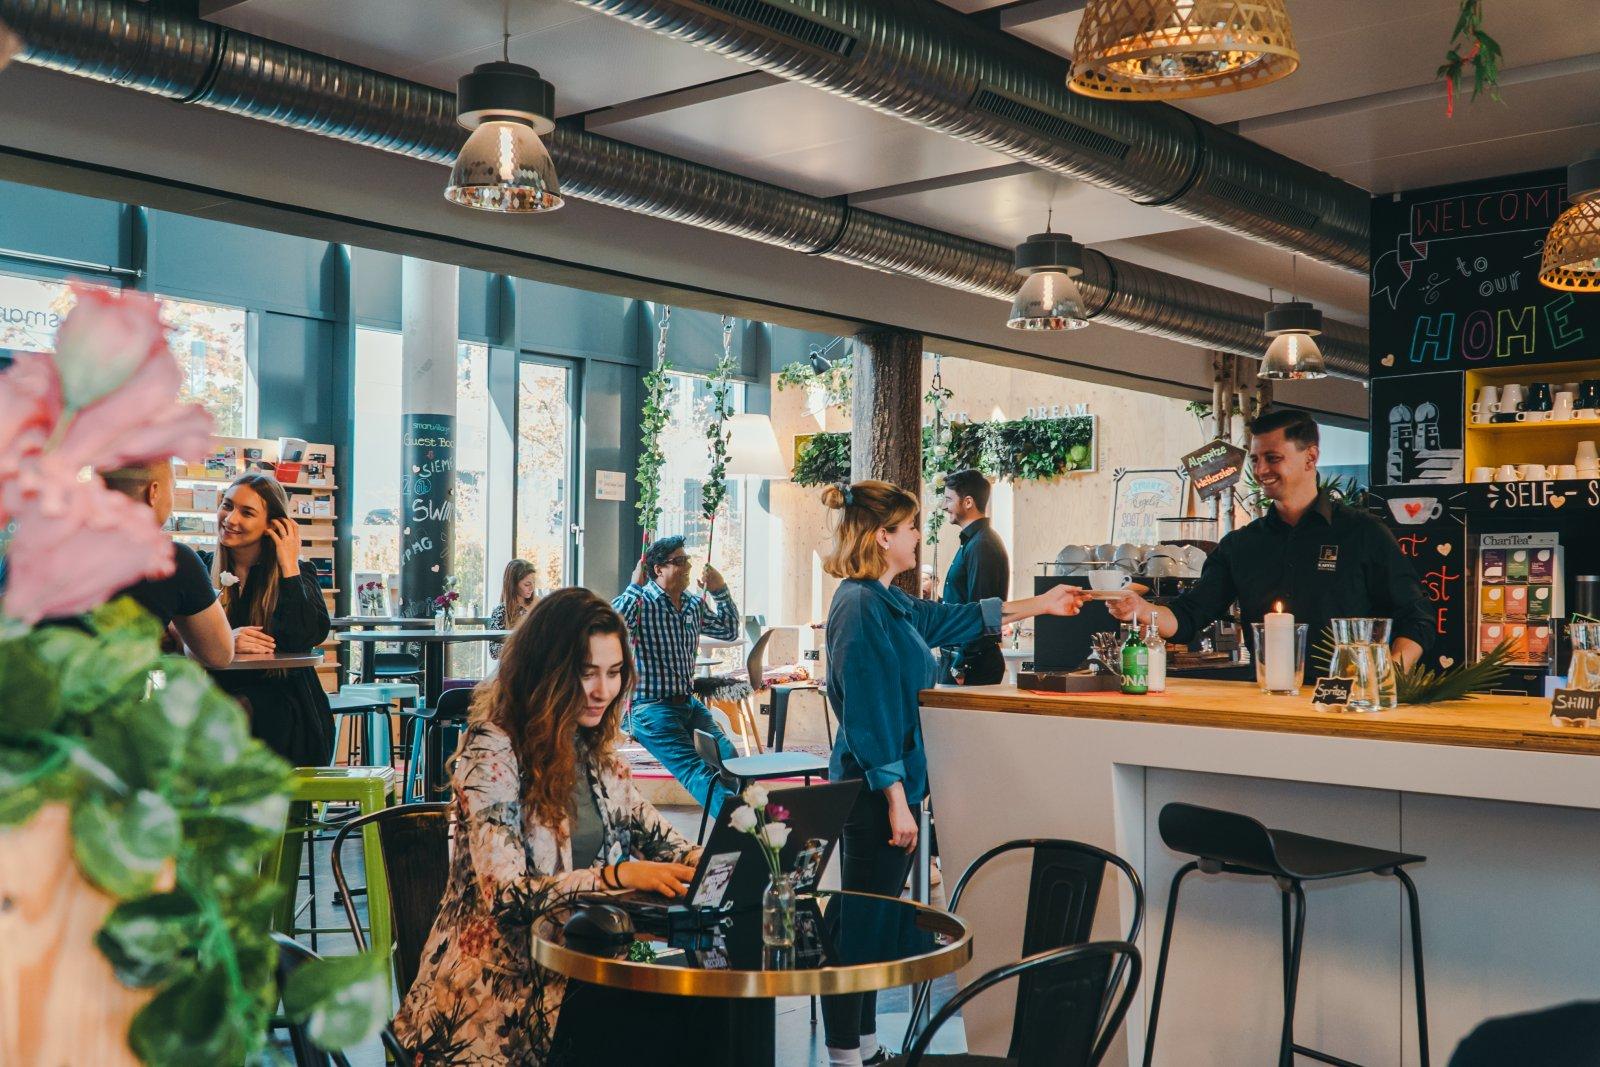 Unser smartvillage Café